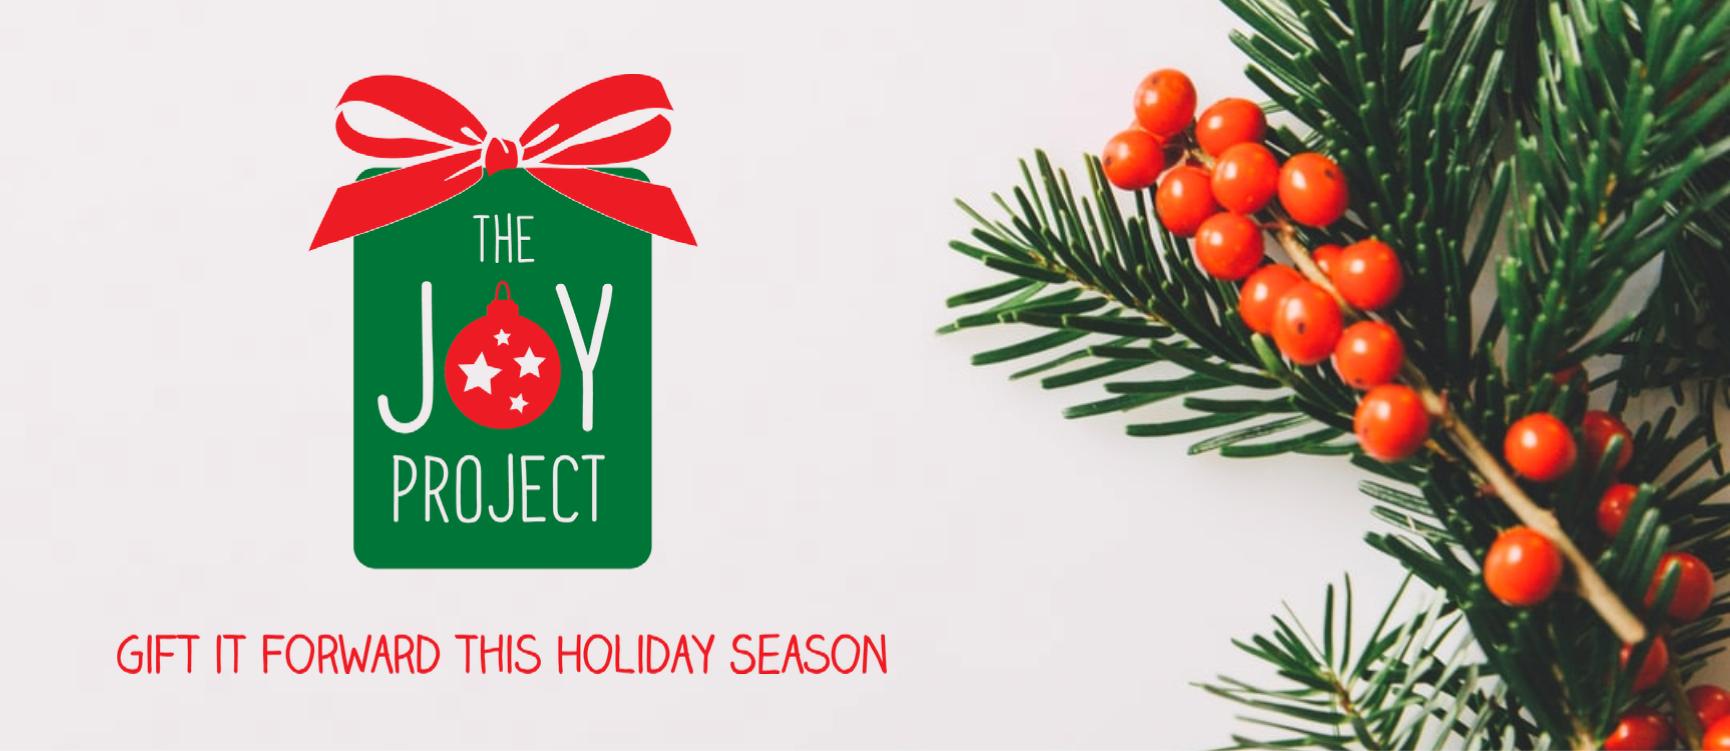 The Joy Project - Child, Youth & Family Sponsorship Program